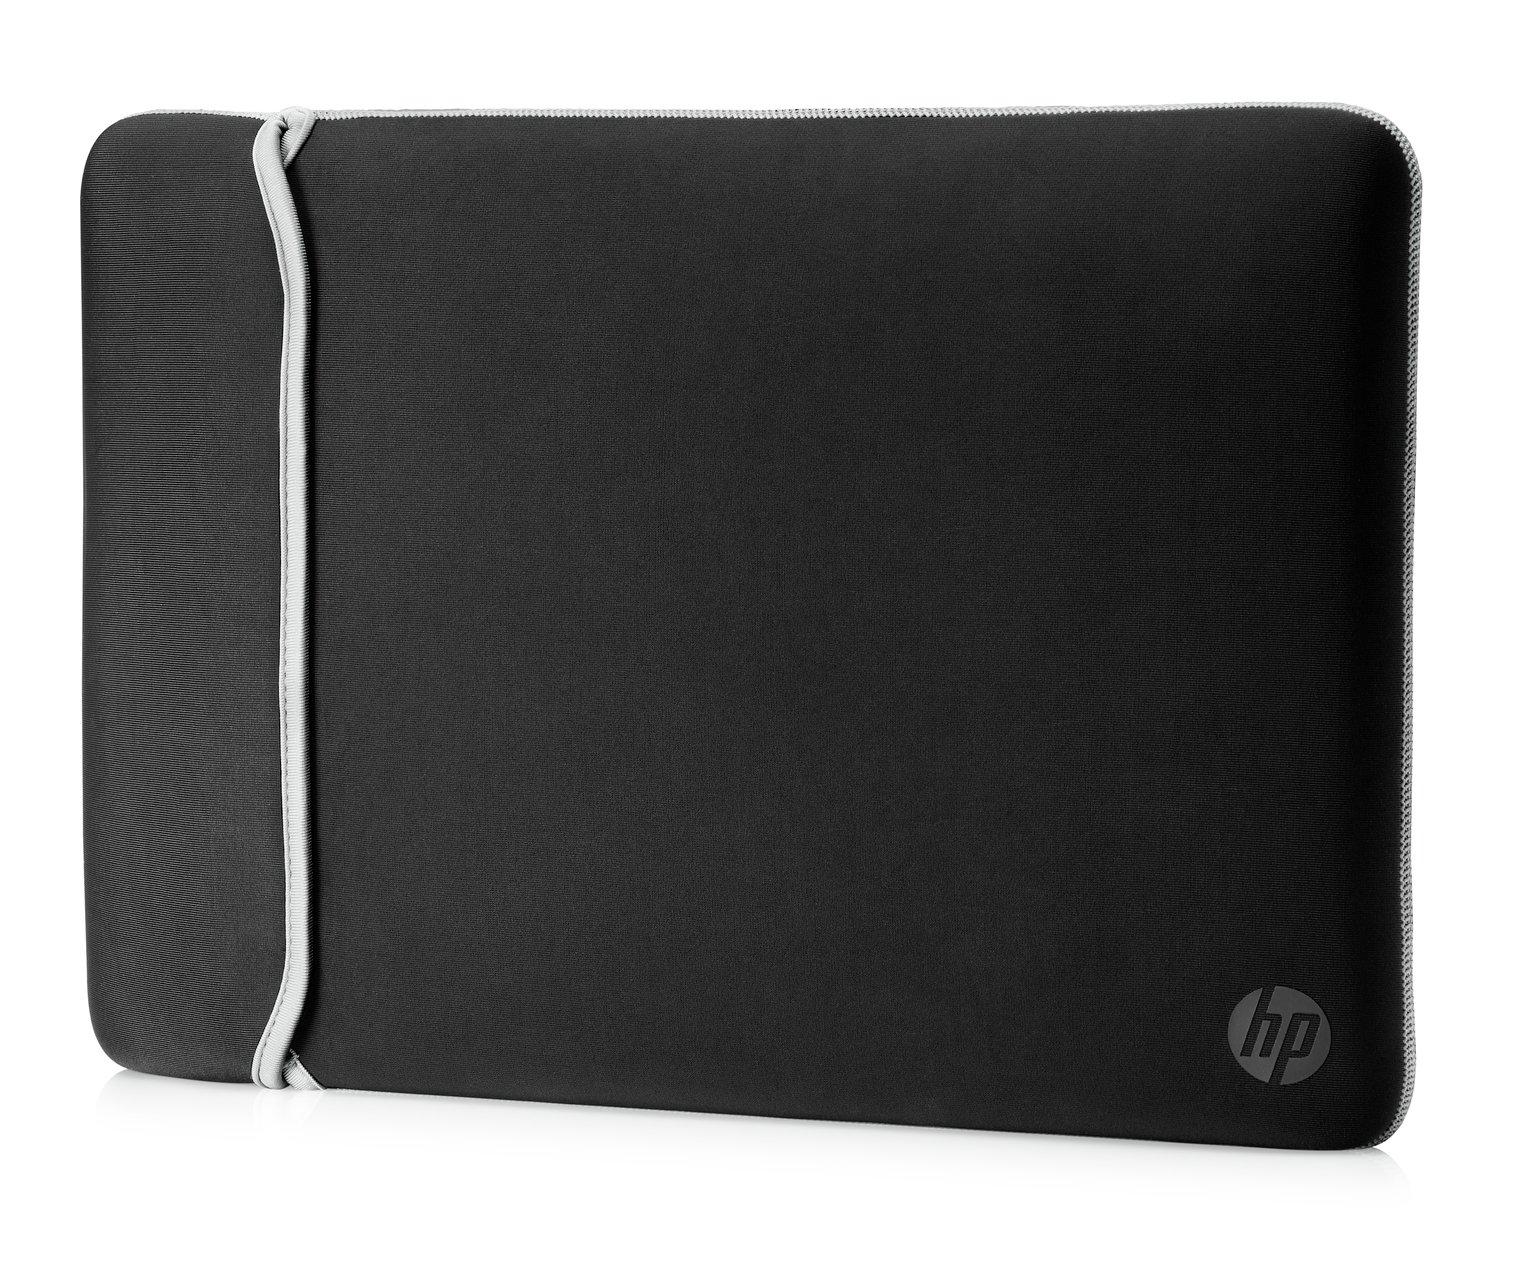 HP 15.6 Inch Reversible Laptop Sleeve - Silver & Black